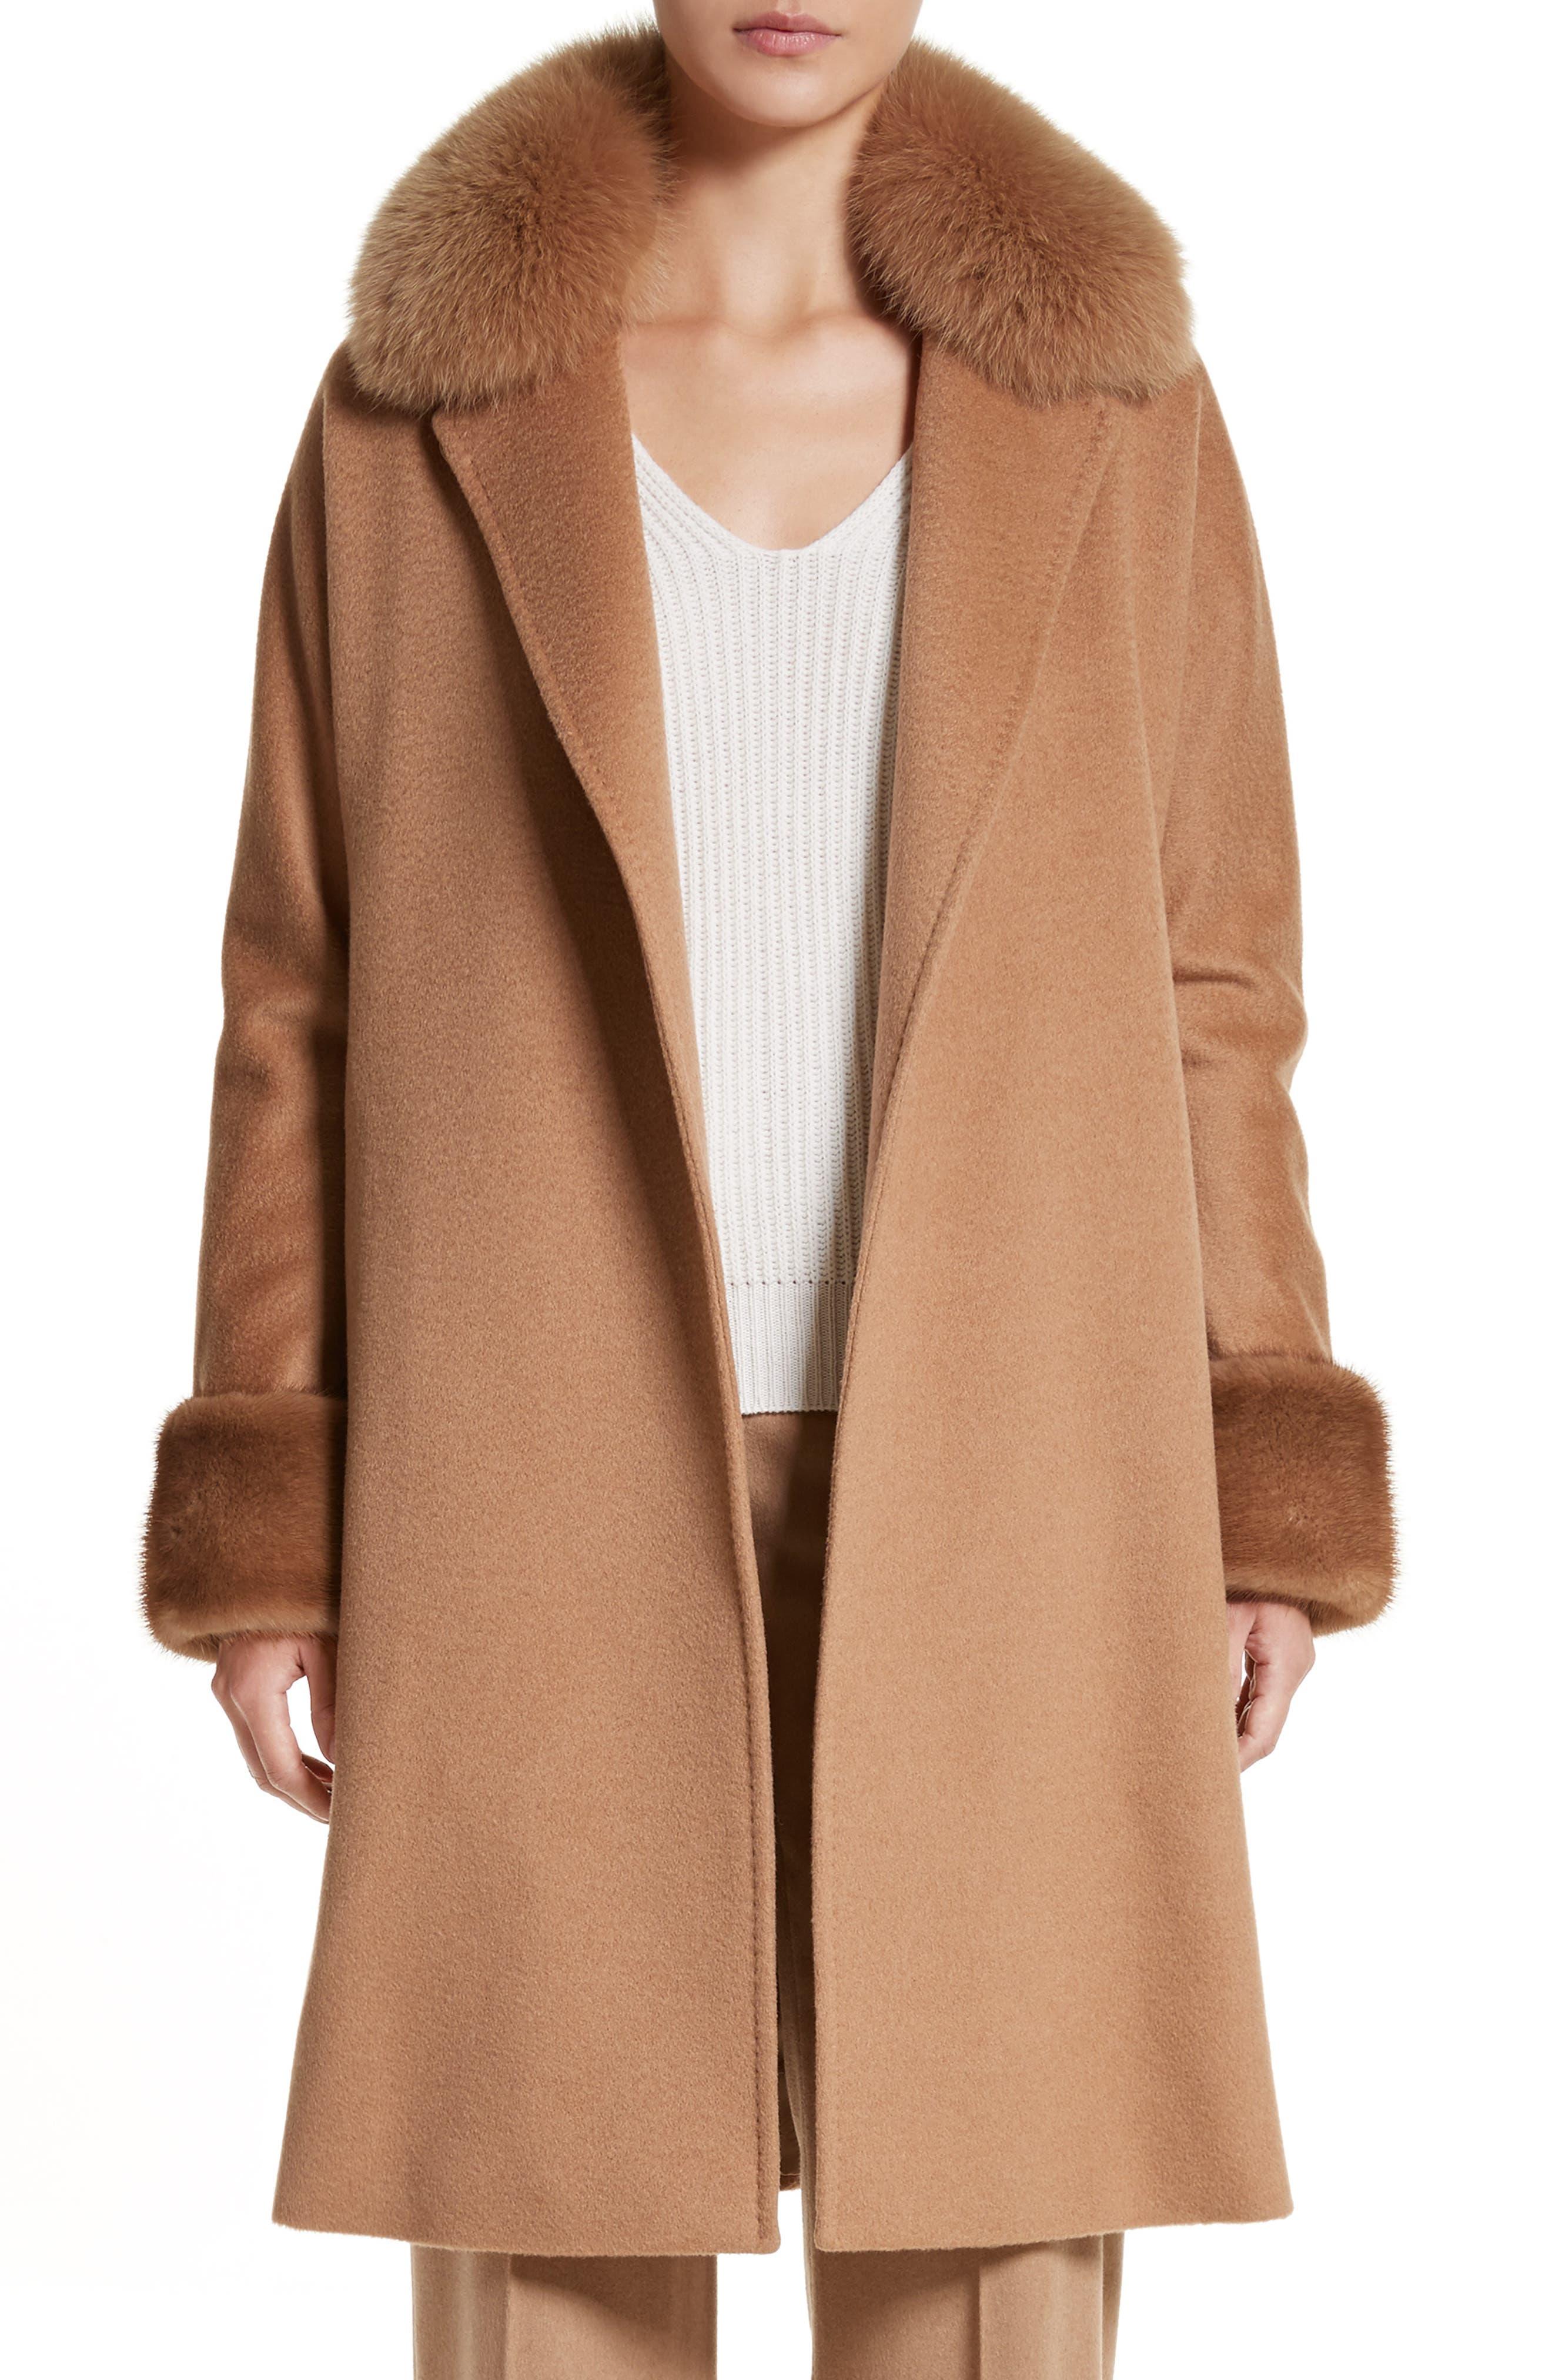 Camel Hair Coat with Genuine Fox Fur & Genuine Mink Fur Trim,                             Main thumbnail 1, color,                             232